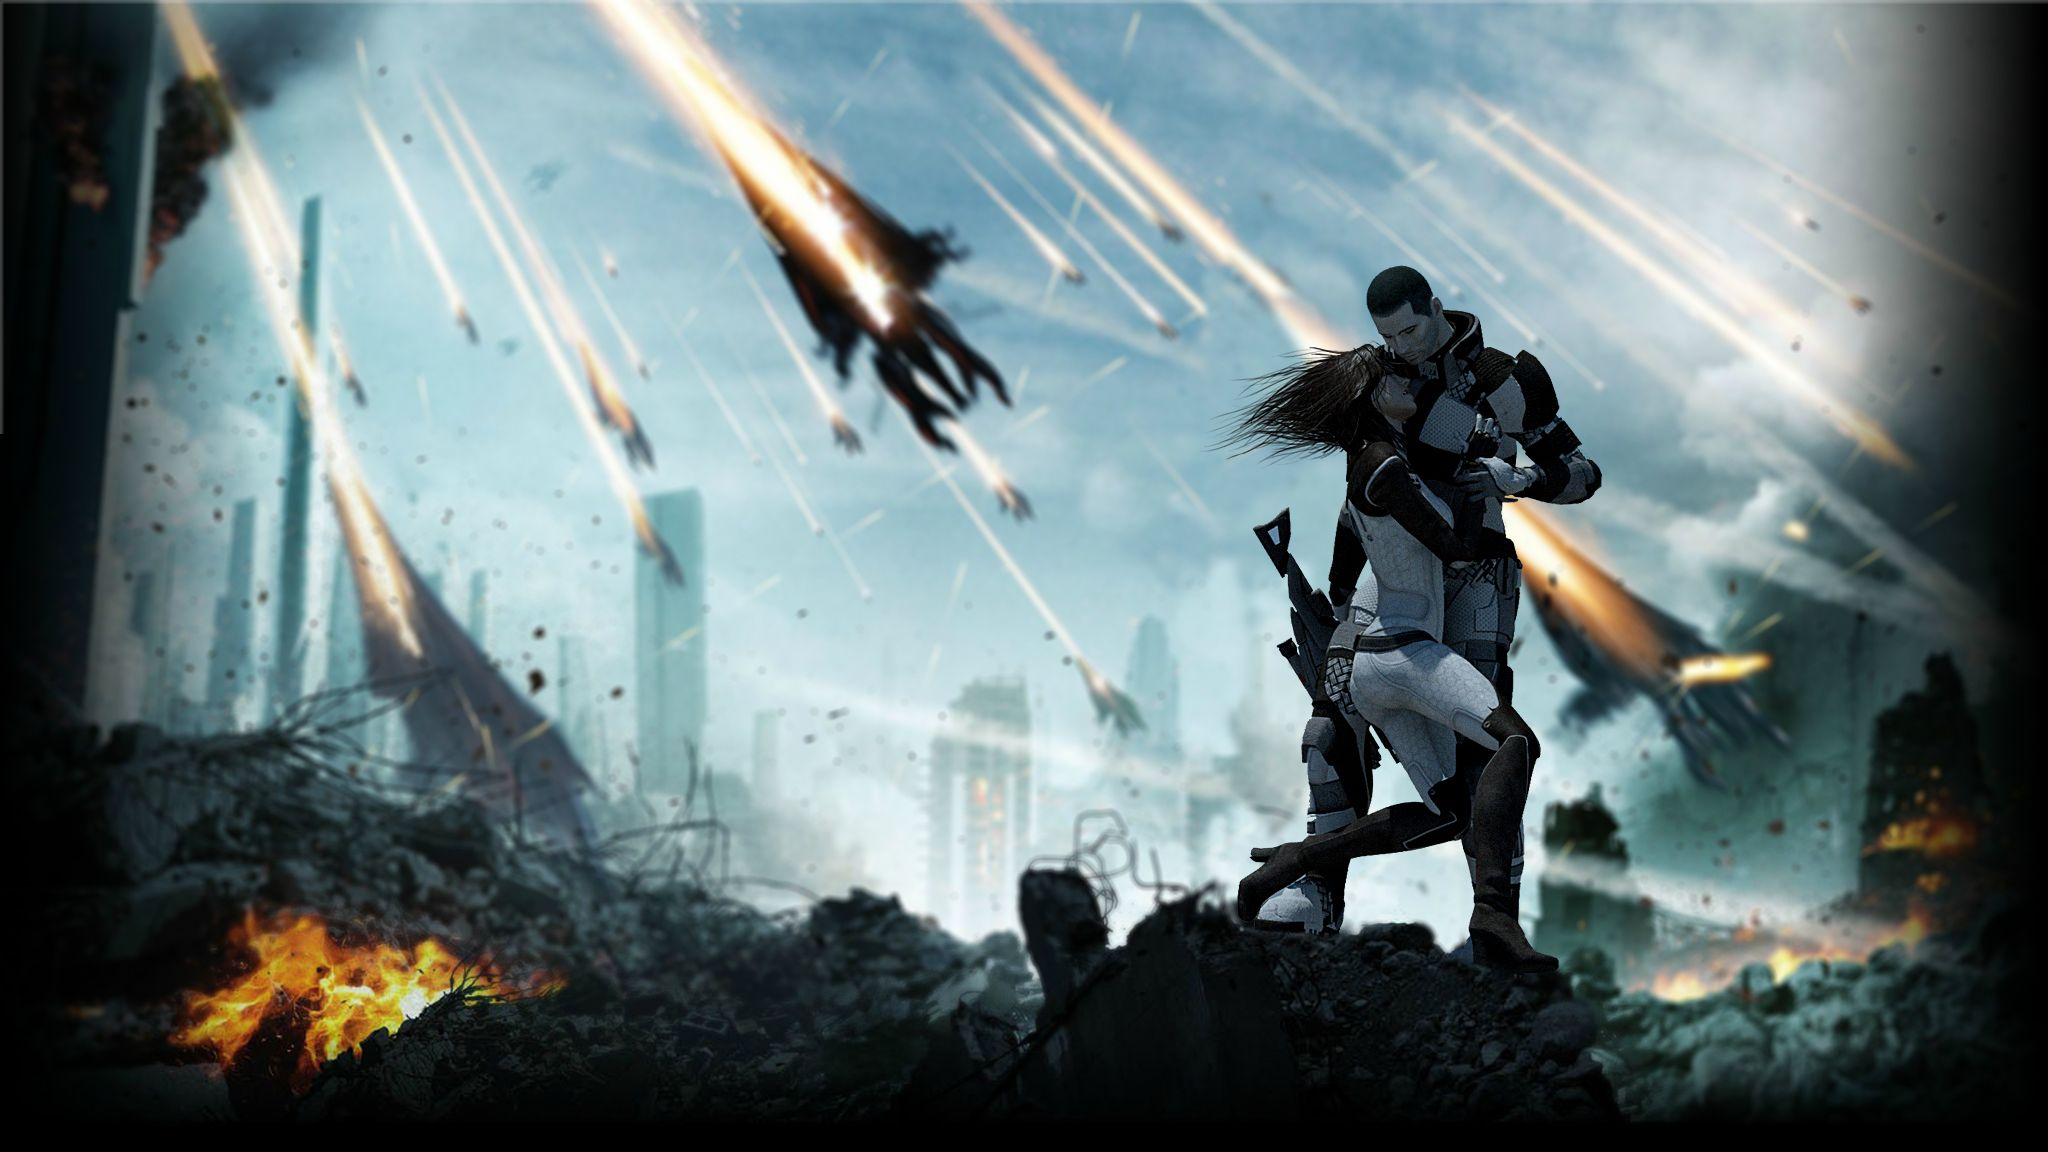 Mass Effect Wallpaper Google Search Mass Effect Background Images Wallpaper Backgrounds